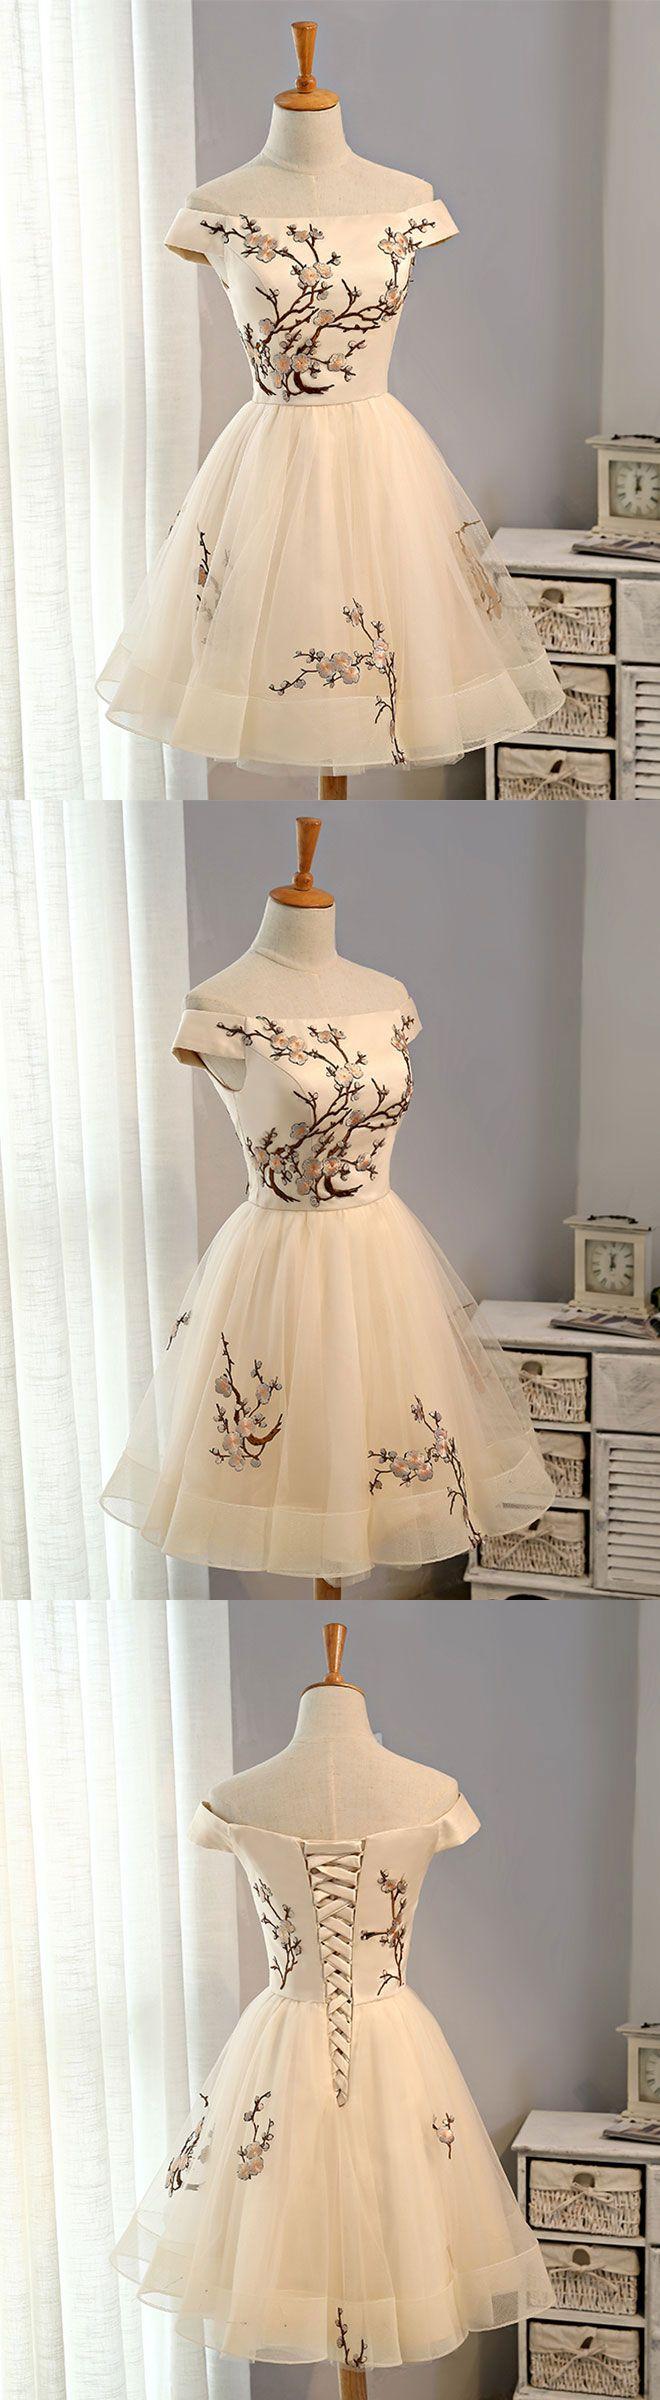 cute short prom dress, homecoming dress, party dress